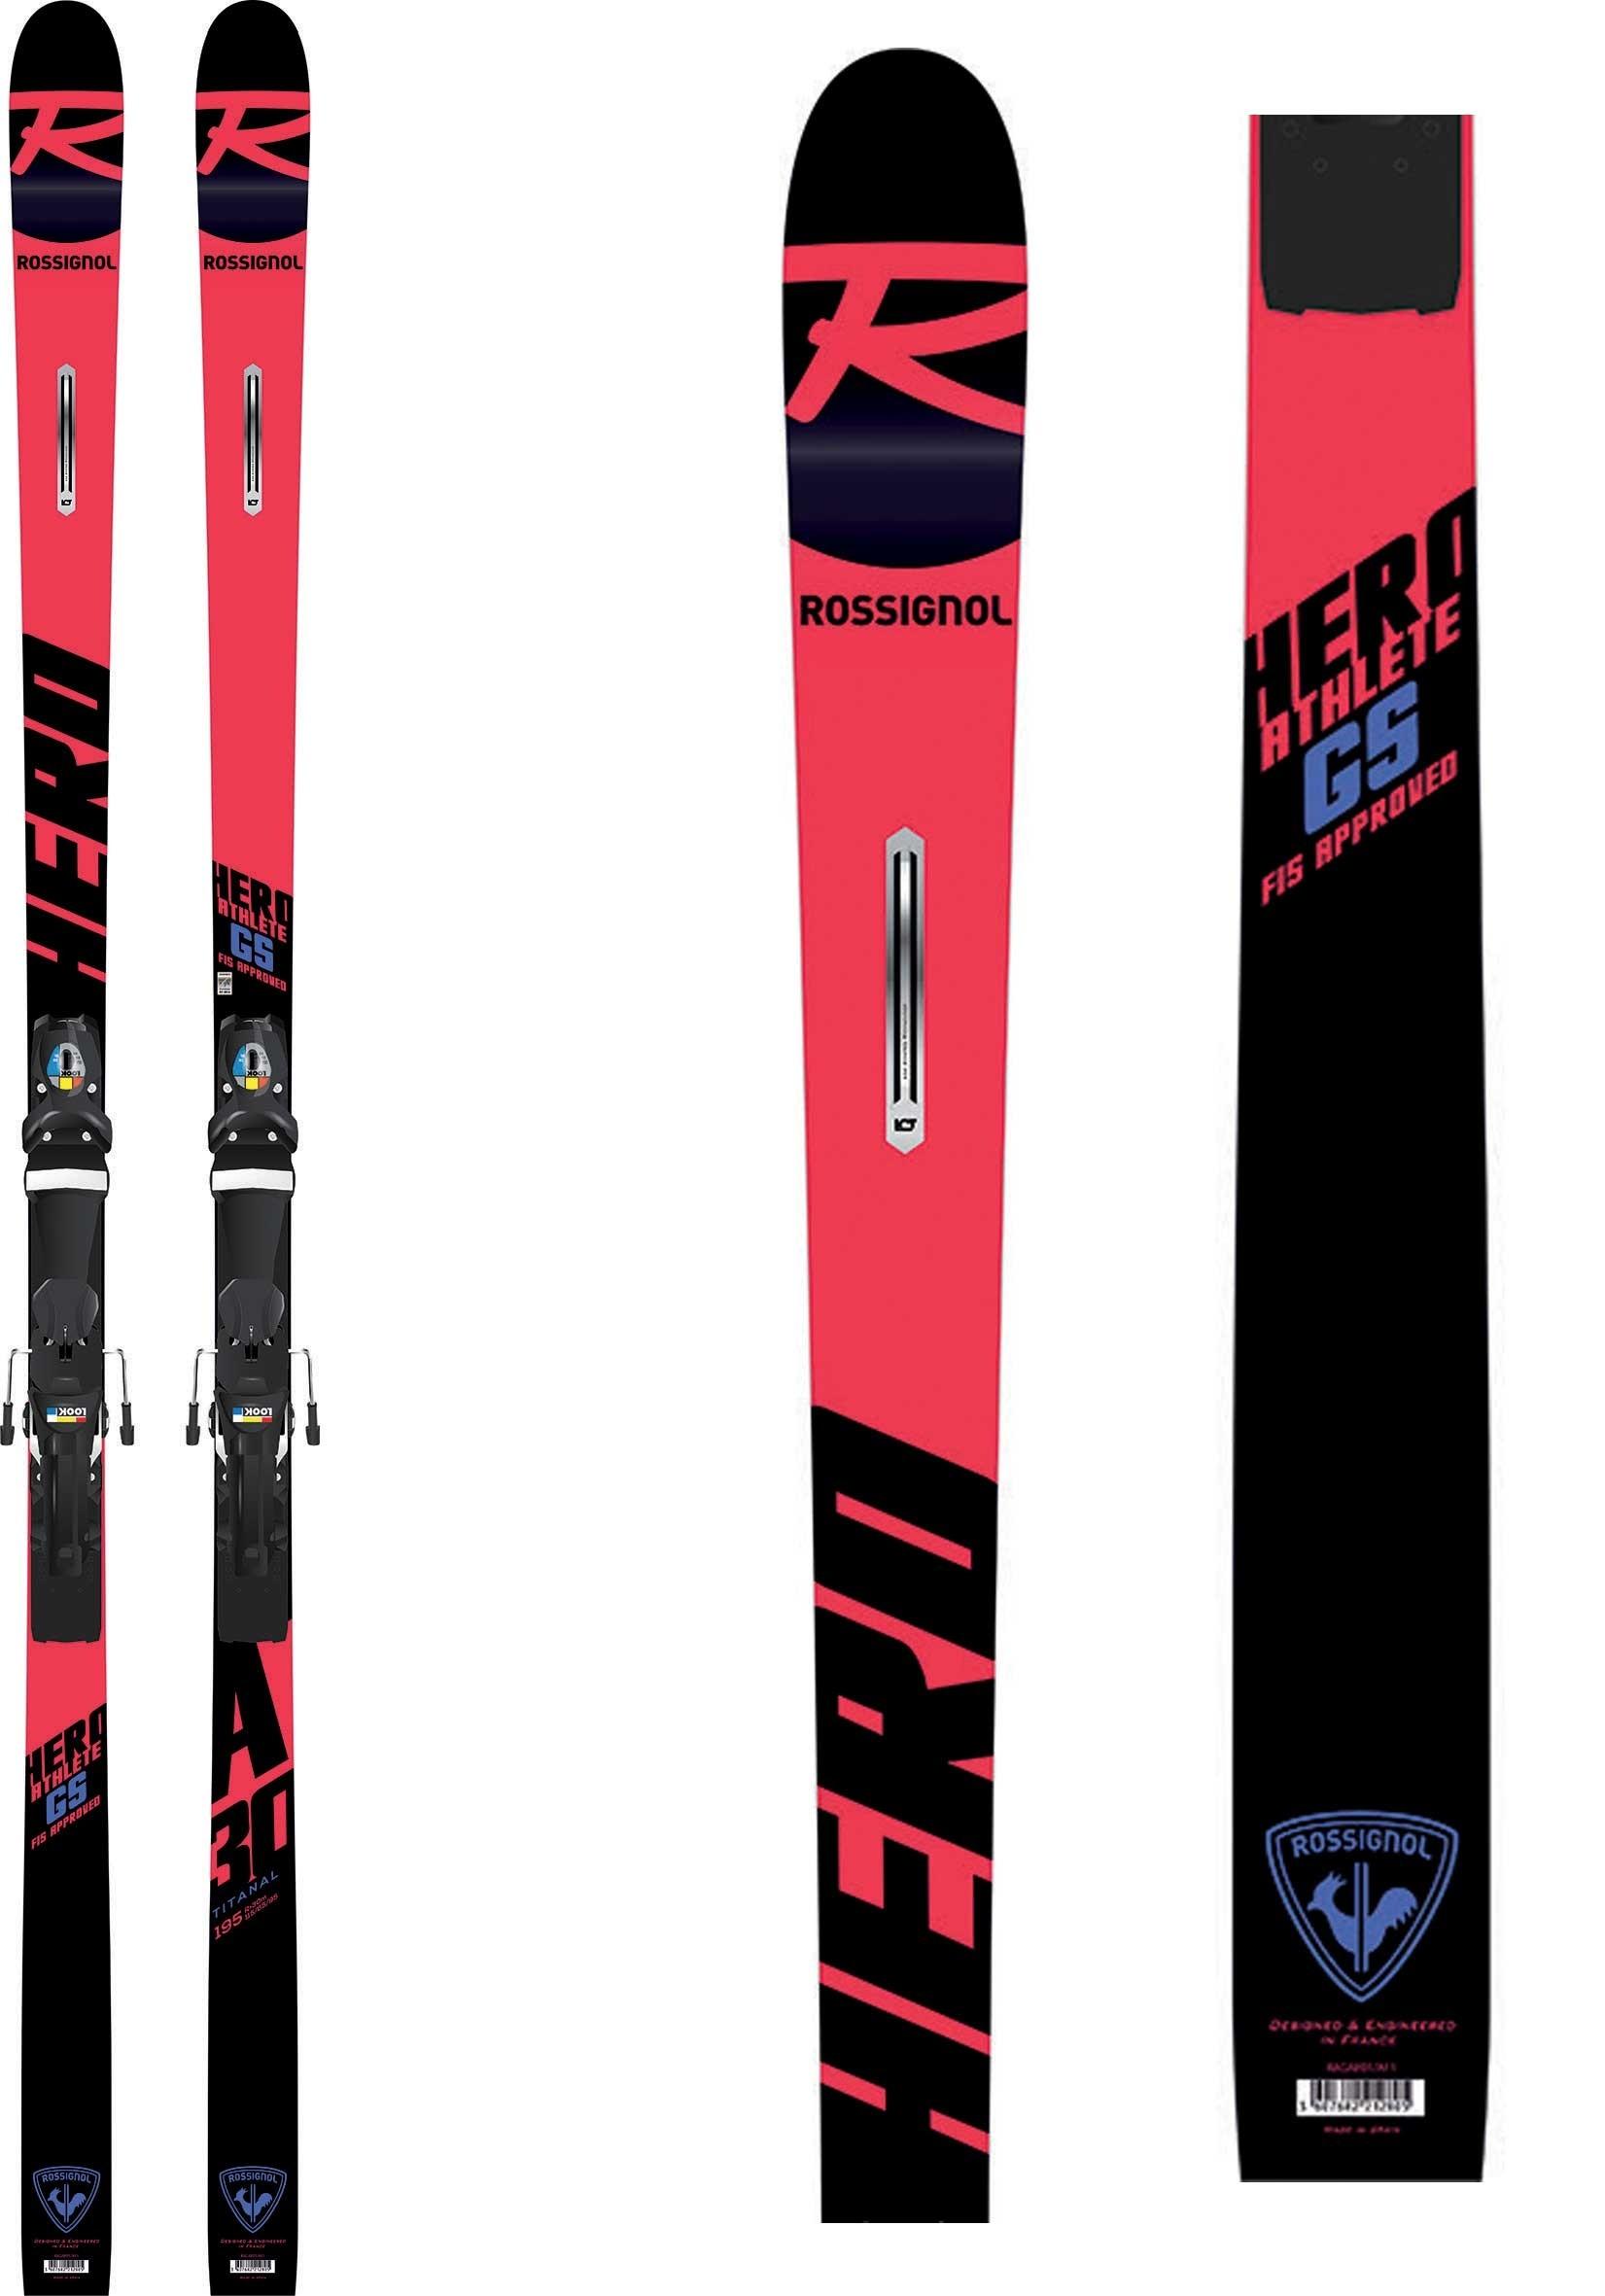 Rossignol Skis Hero Athlete Fis Gs 2019